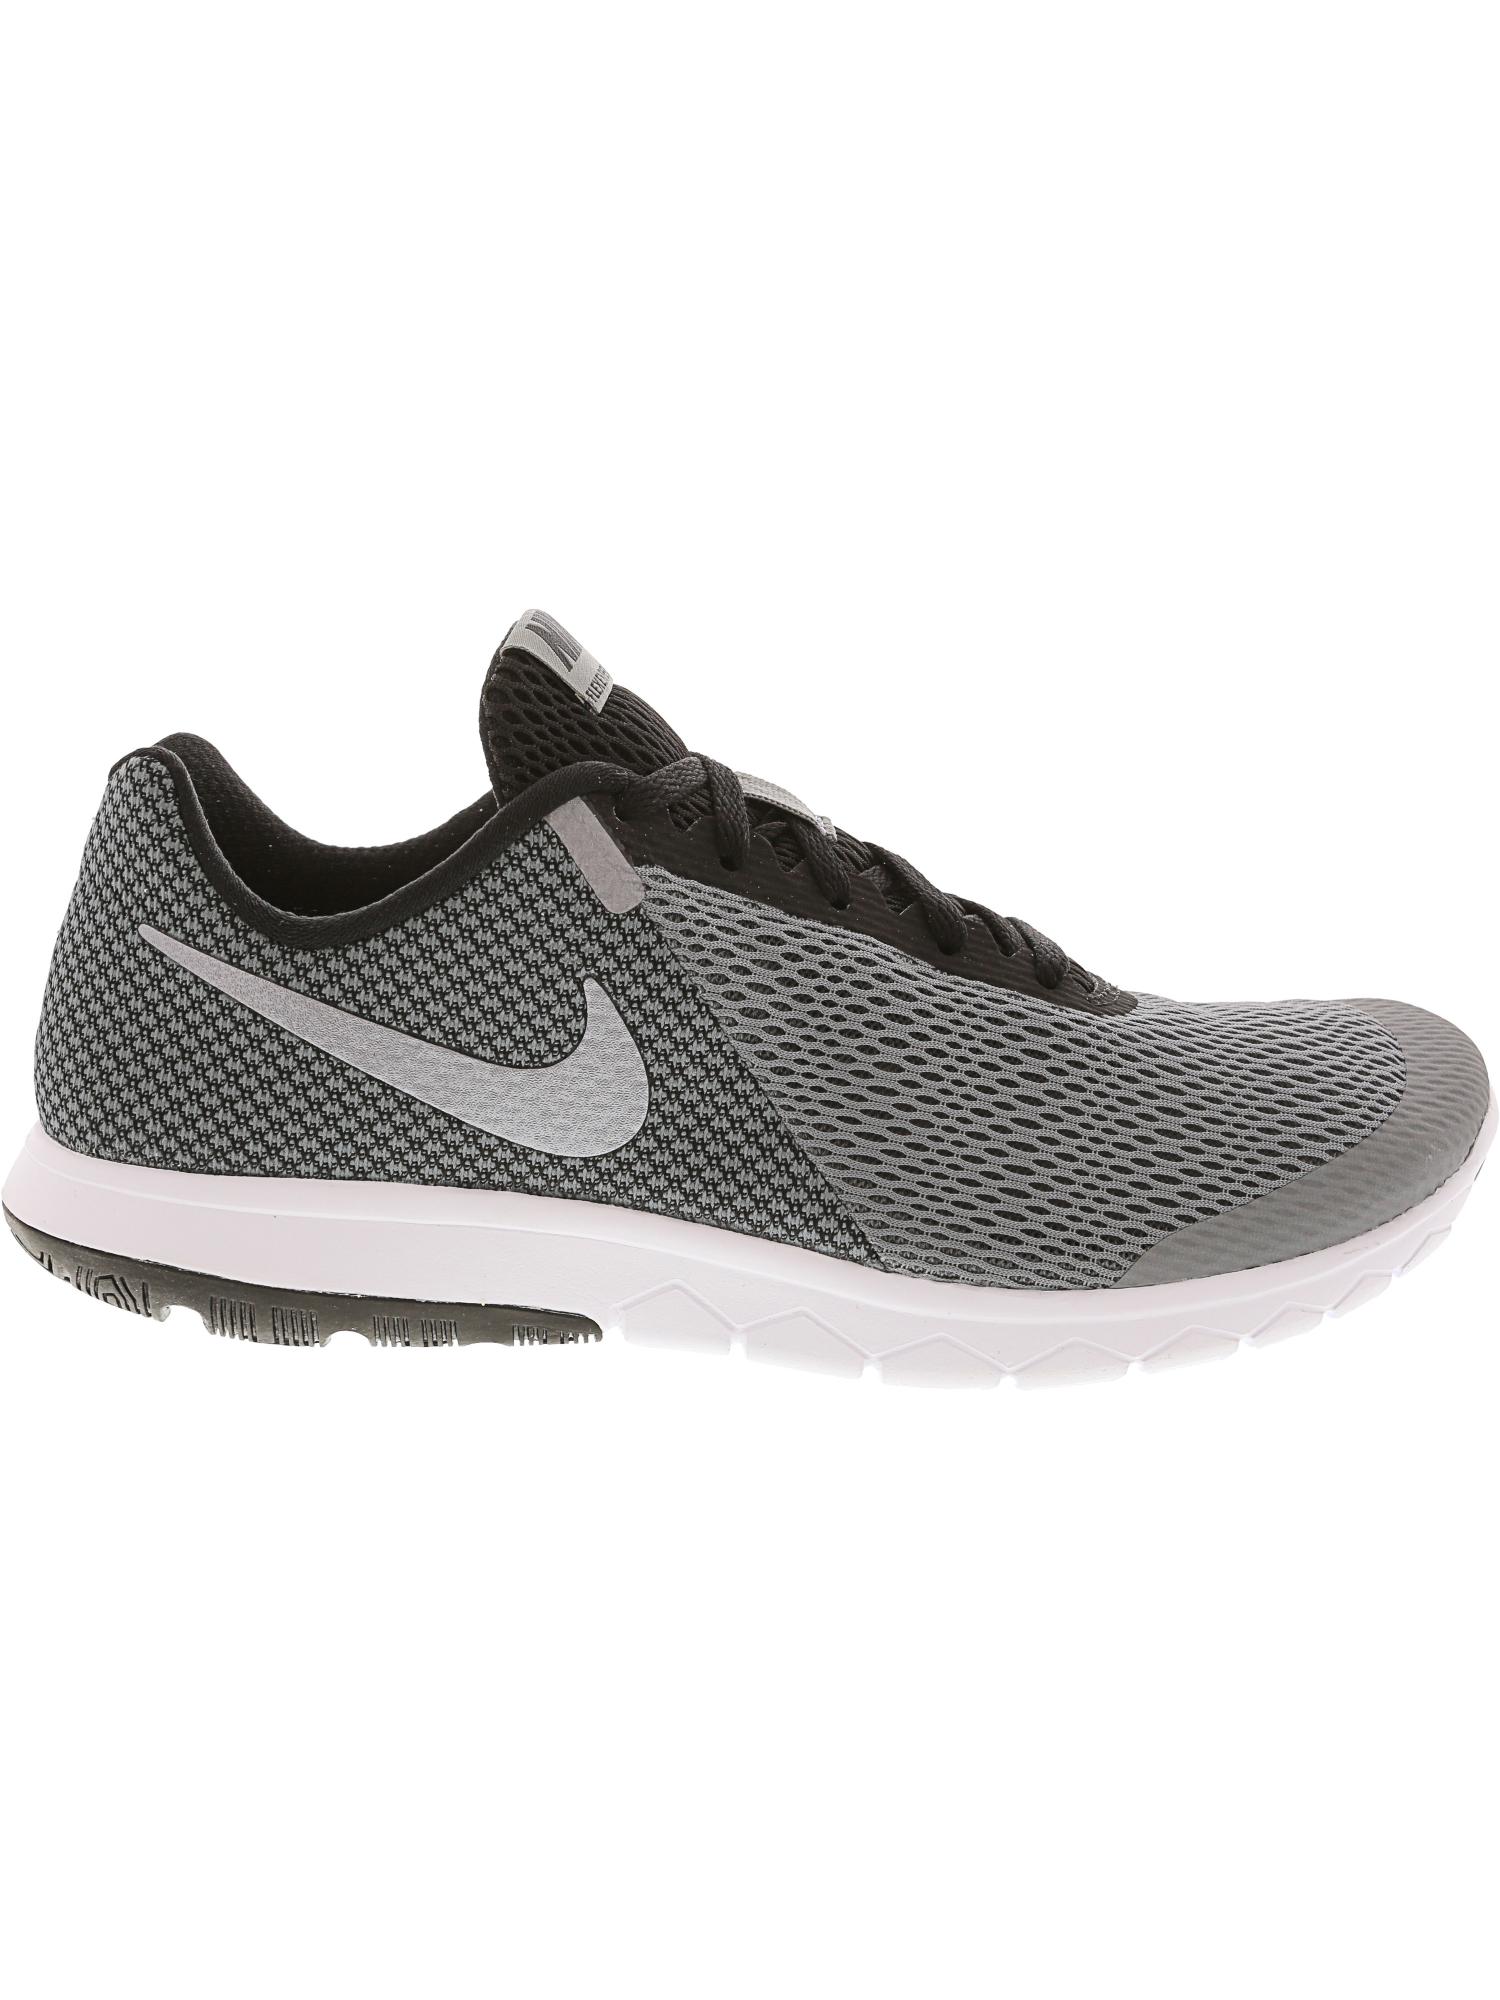 71788bca70b1 Nike-Women-039-s-Flex-Experience-Rn-6 thumbnail